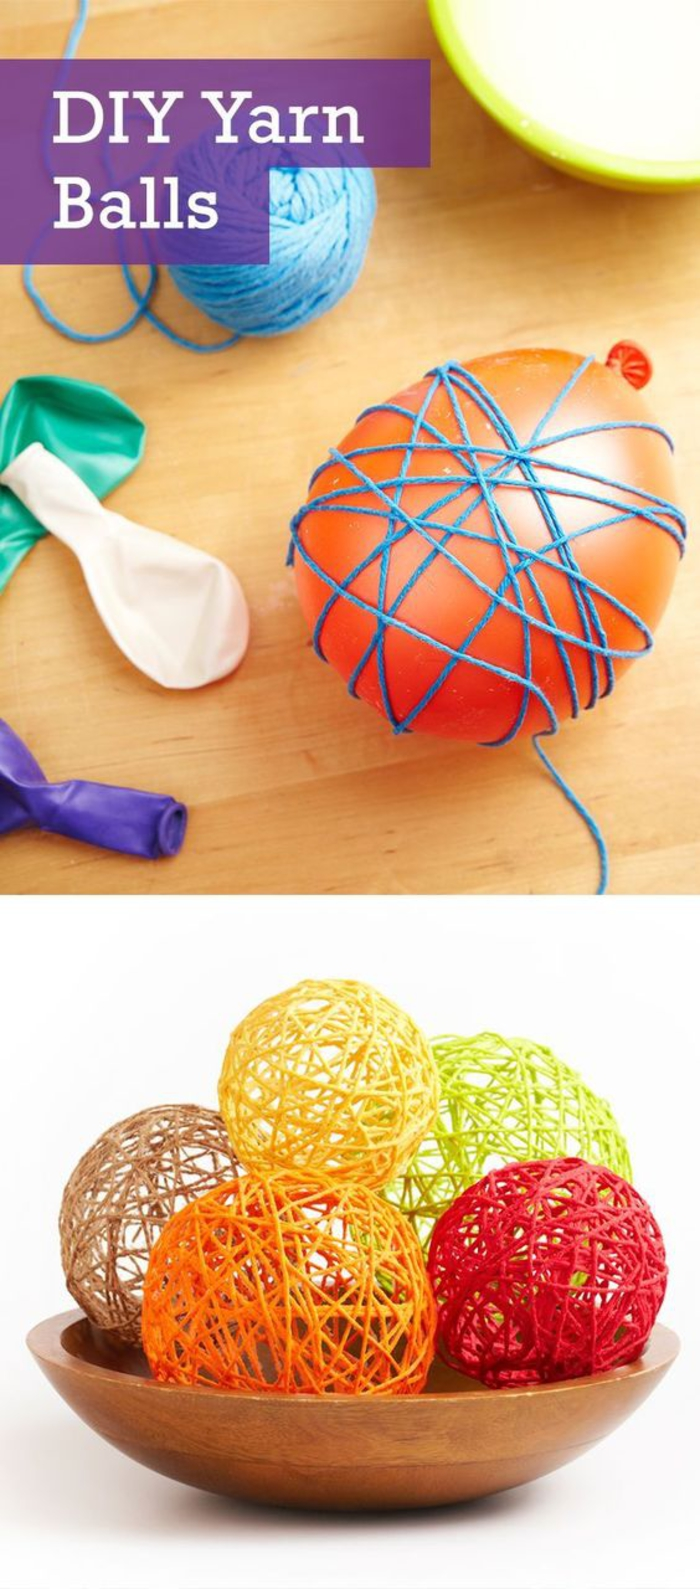 bunte Kugeln selber basteln, Materialien: Ballons, Garn, Klebstoff, DIY Ideen für Kinder